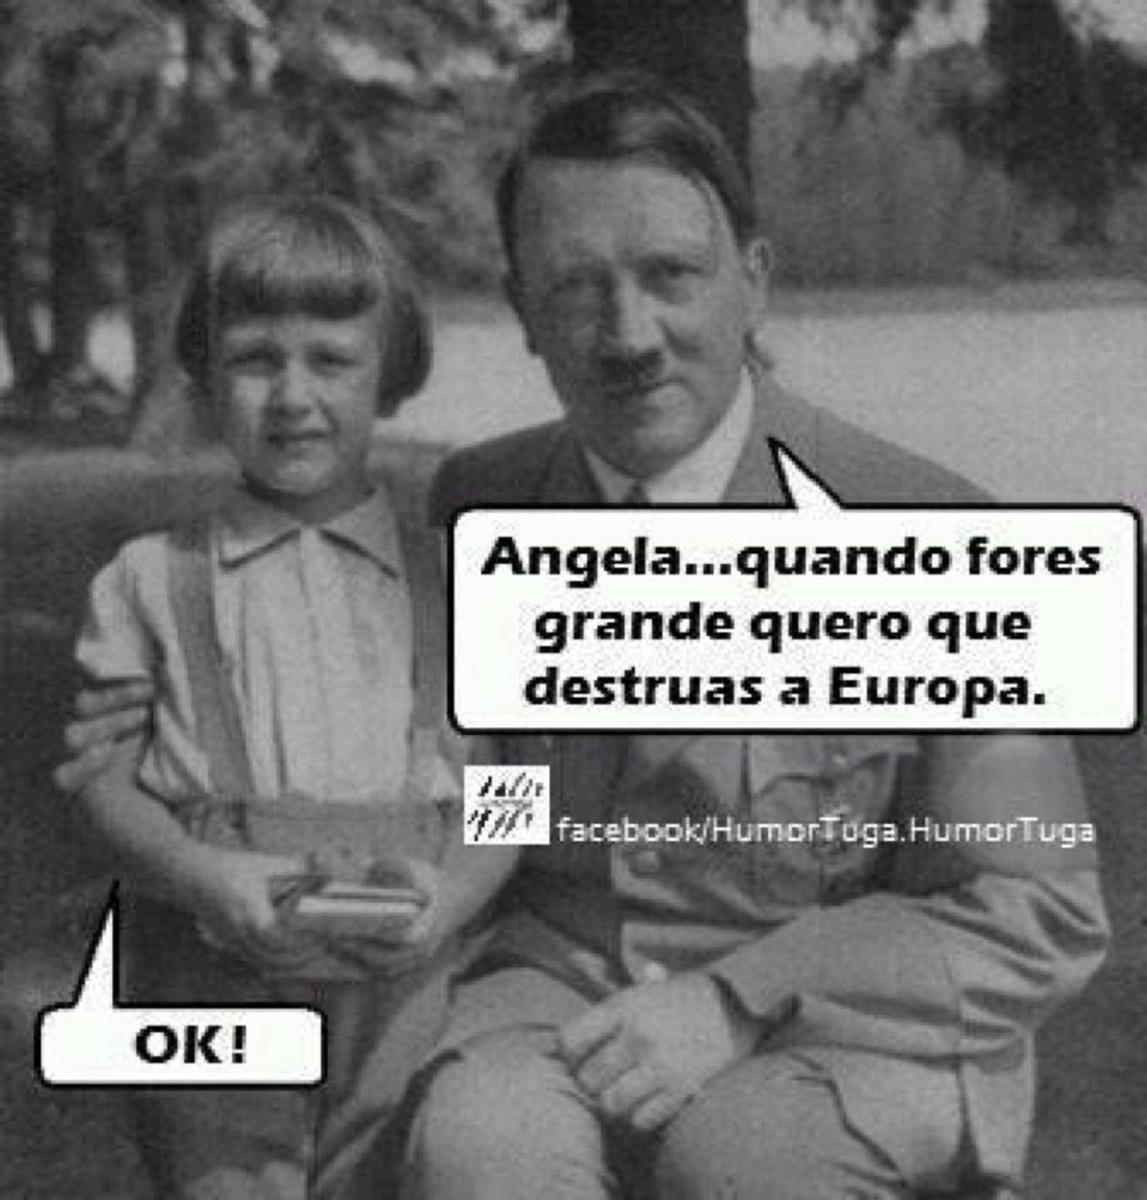 Young Angela Merkel with Adolf Hitler